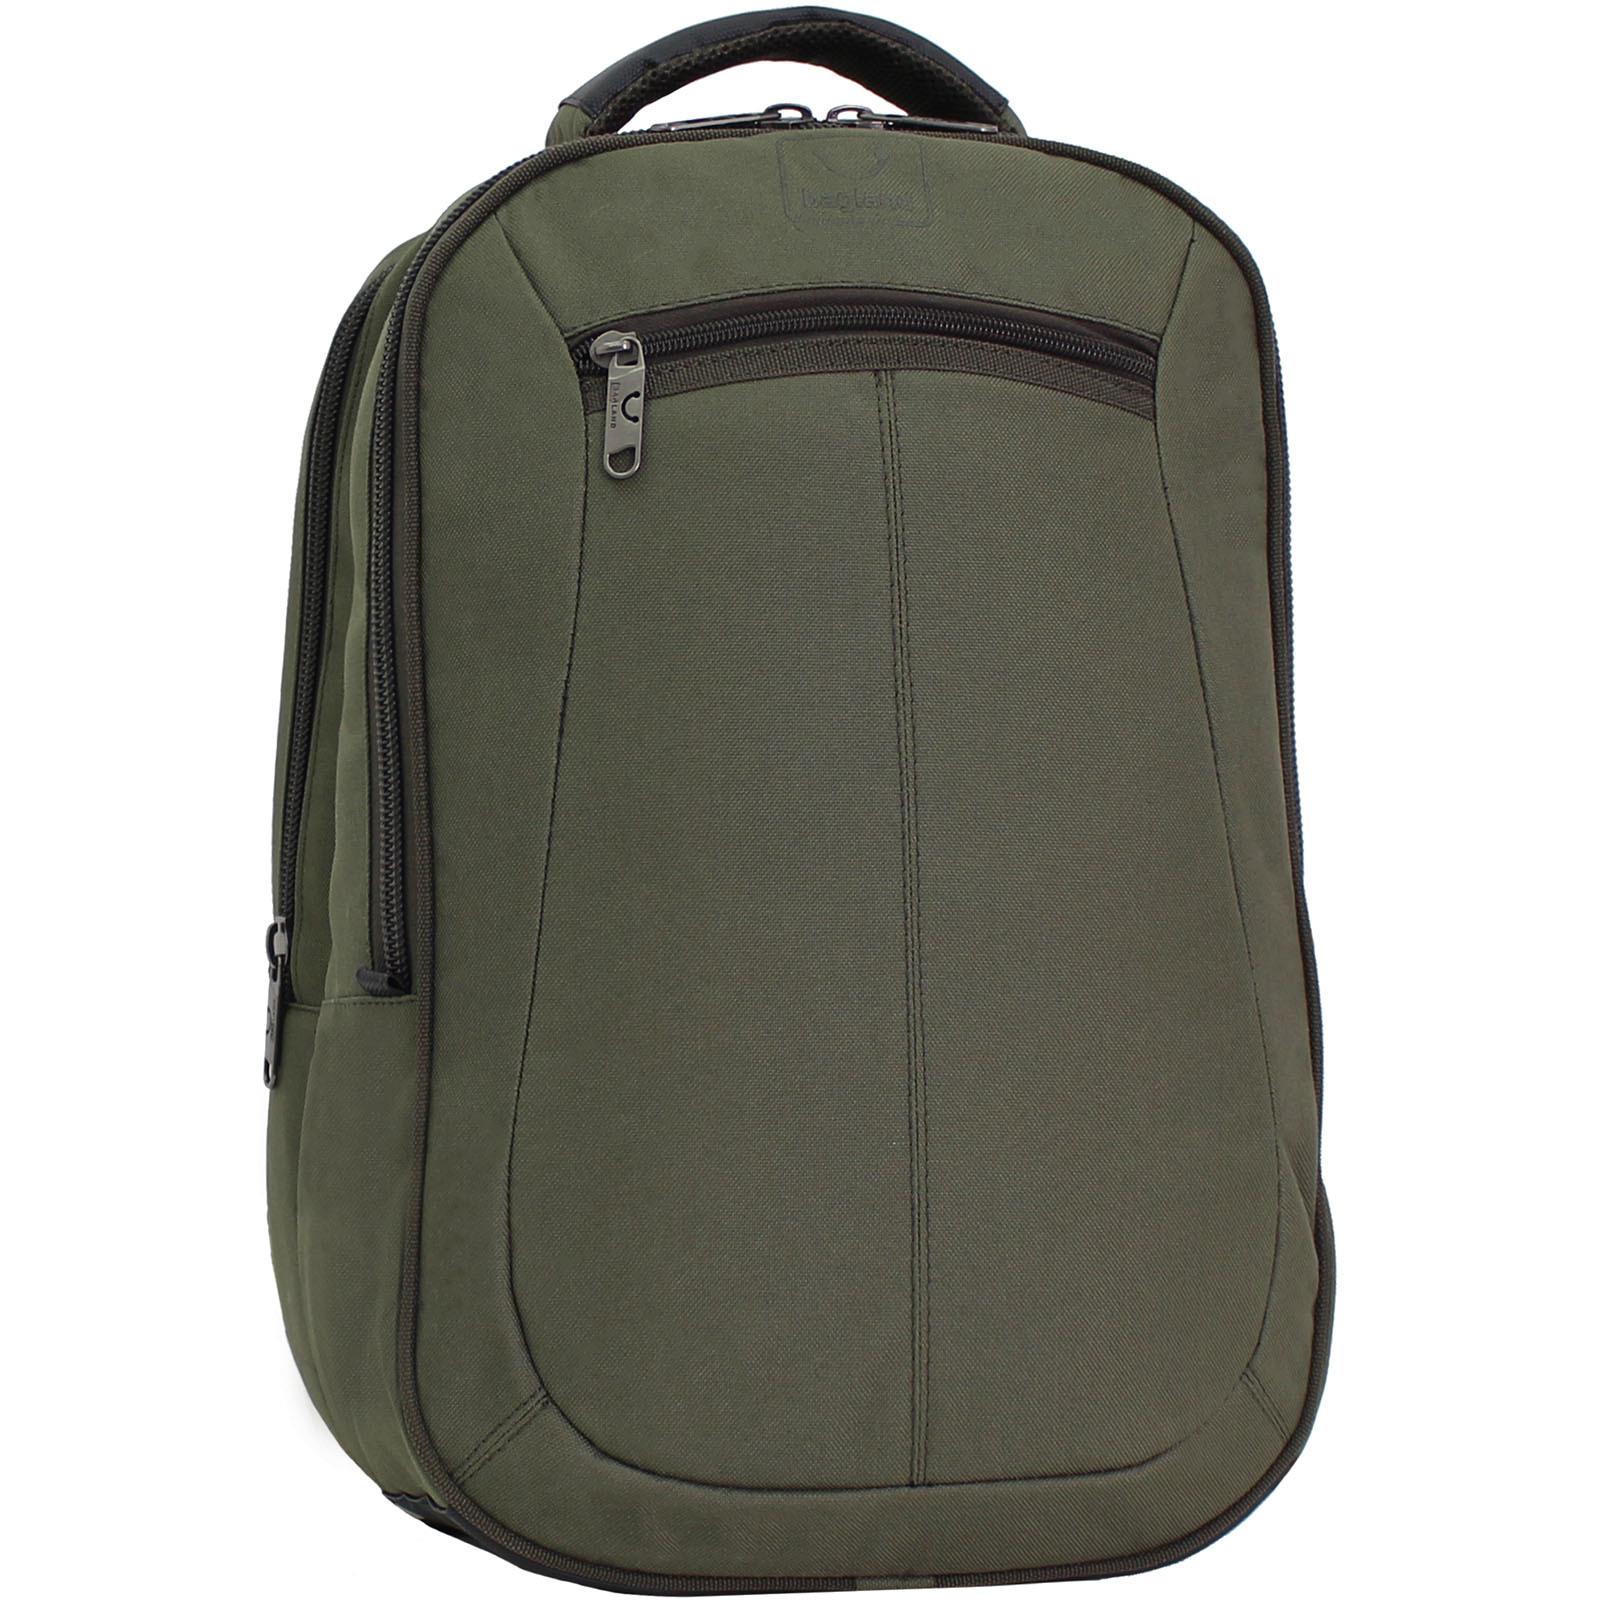 Рюкзак для ноутбука Bagland Рюкзак под ноутбук 536 22 л. Хаки (0053666) фото 1